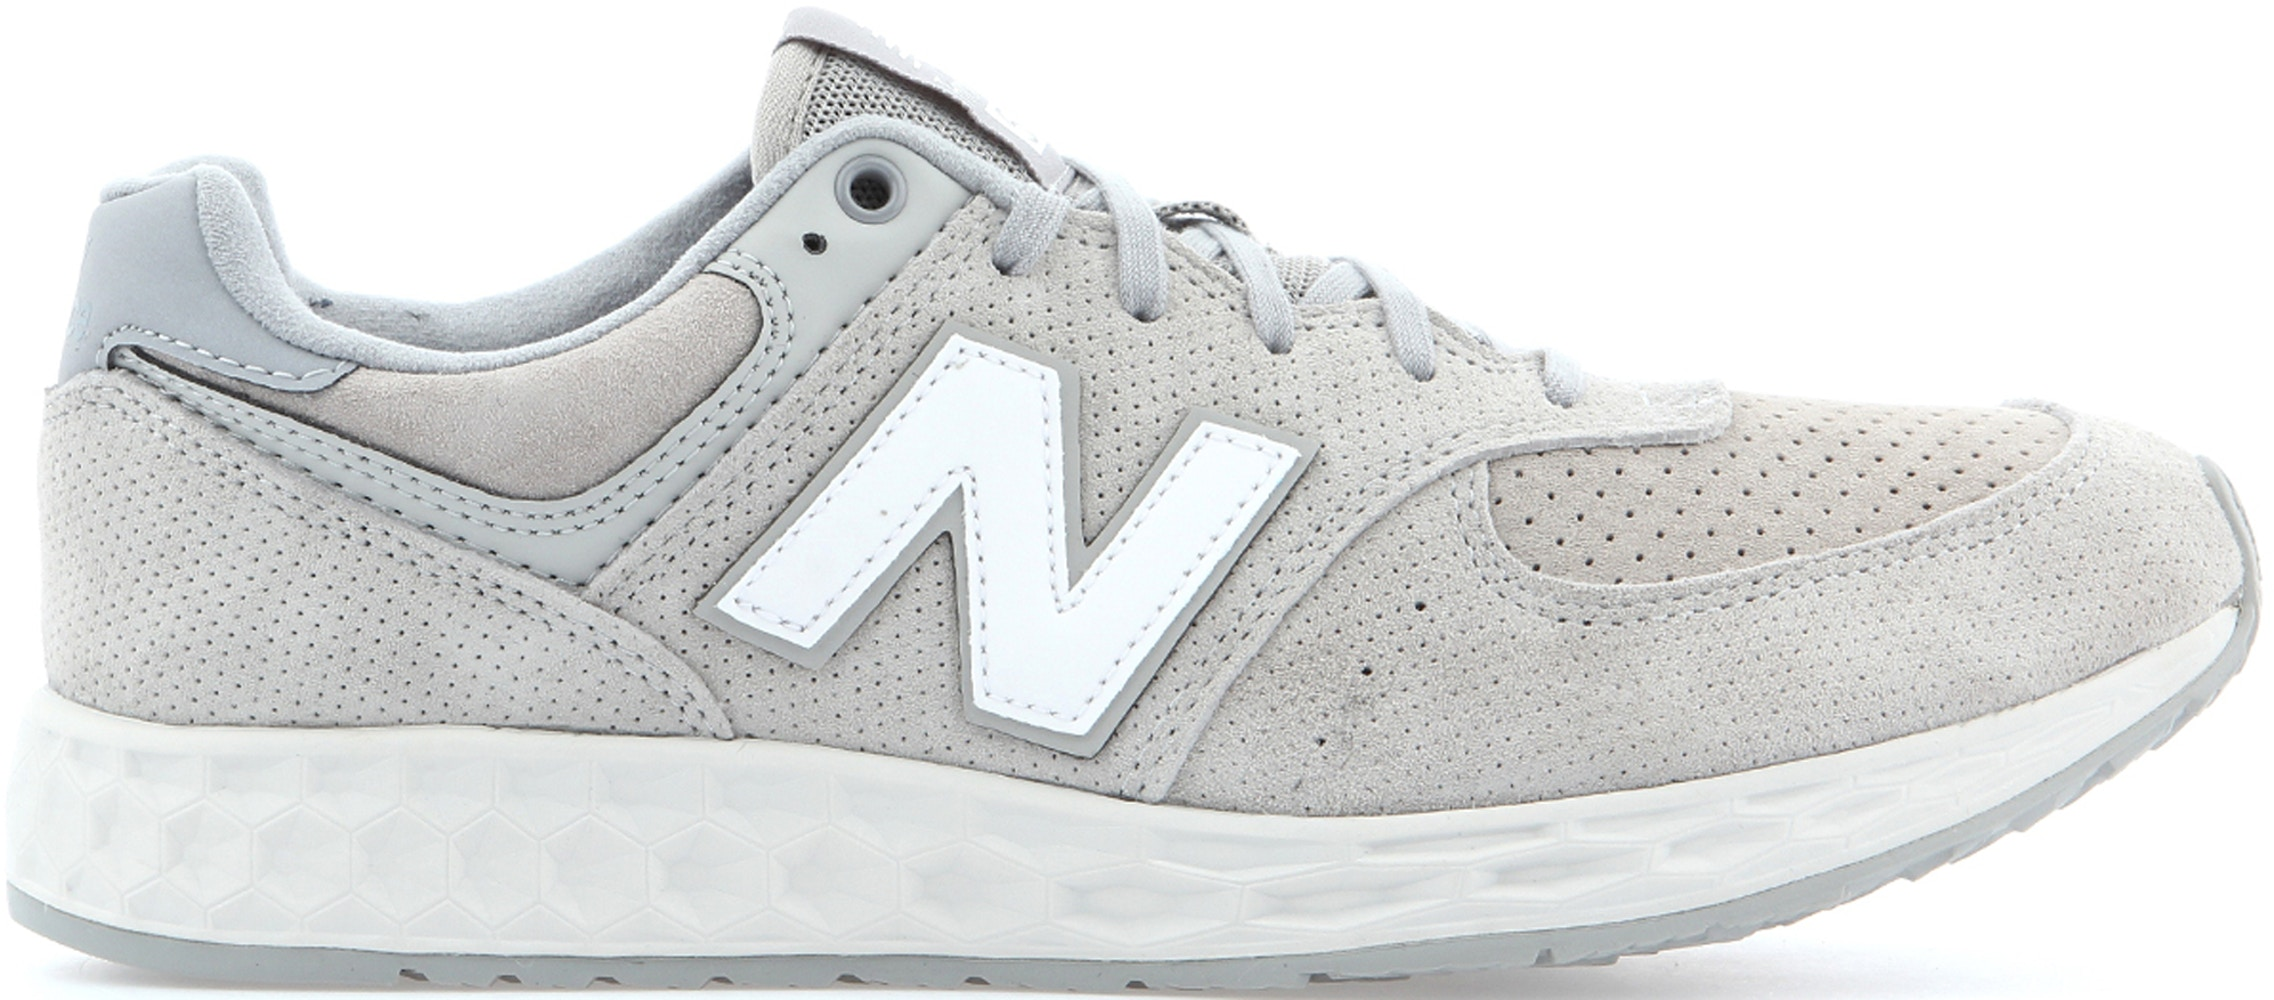 New Balance 574 Fresh Foam Grey White - MFL574FD